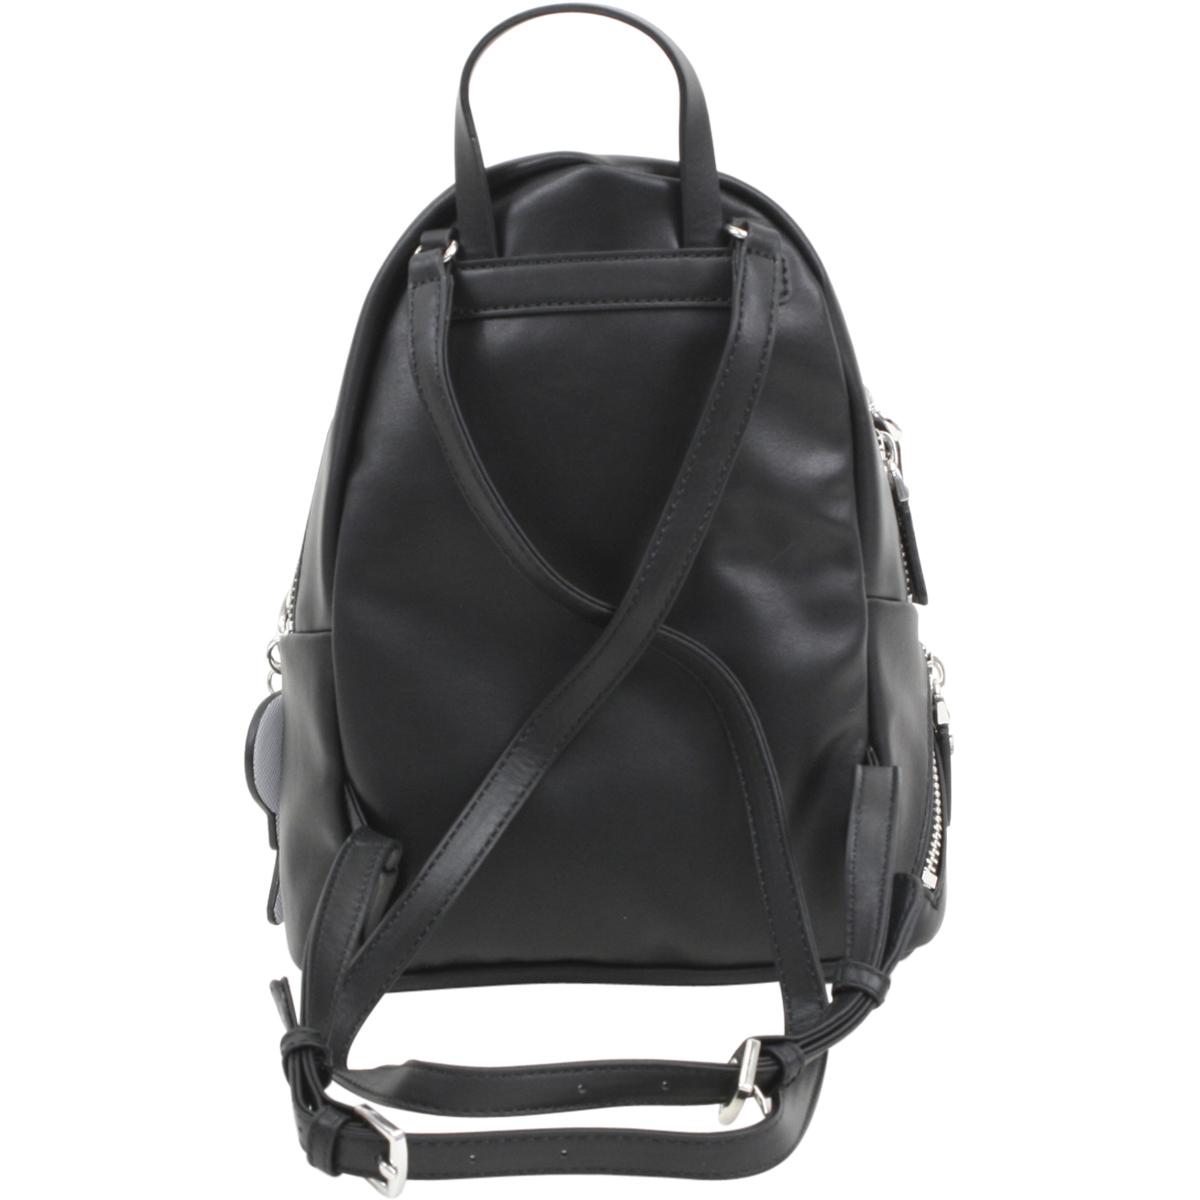 Guess Travel Bag Sale